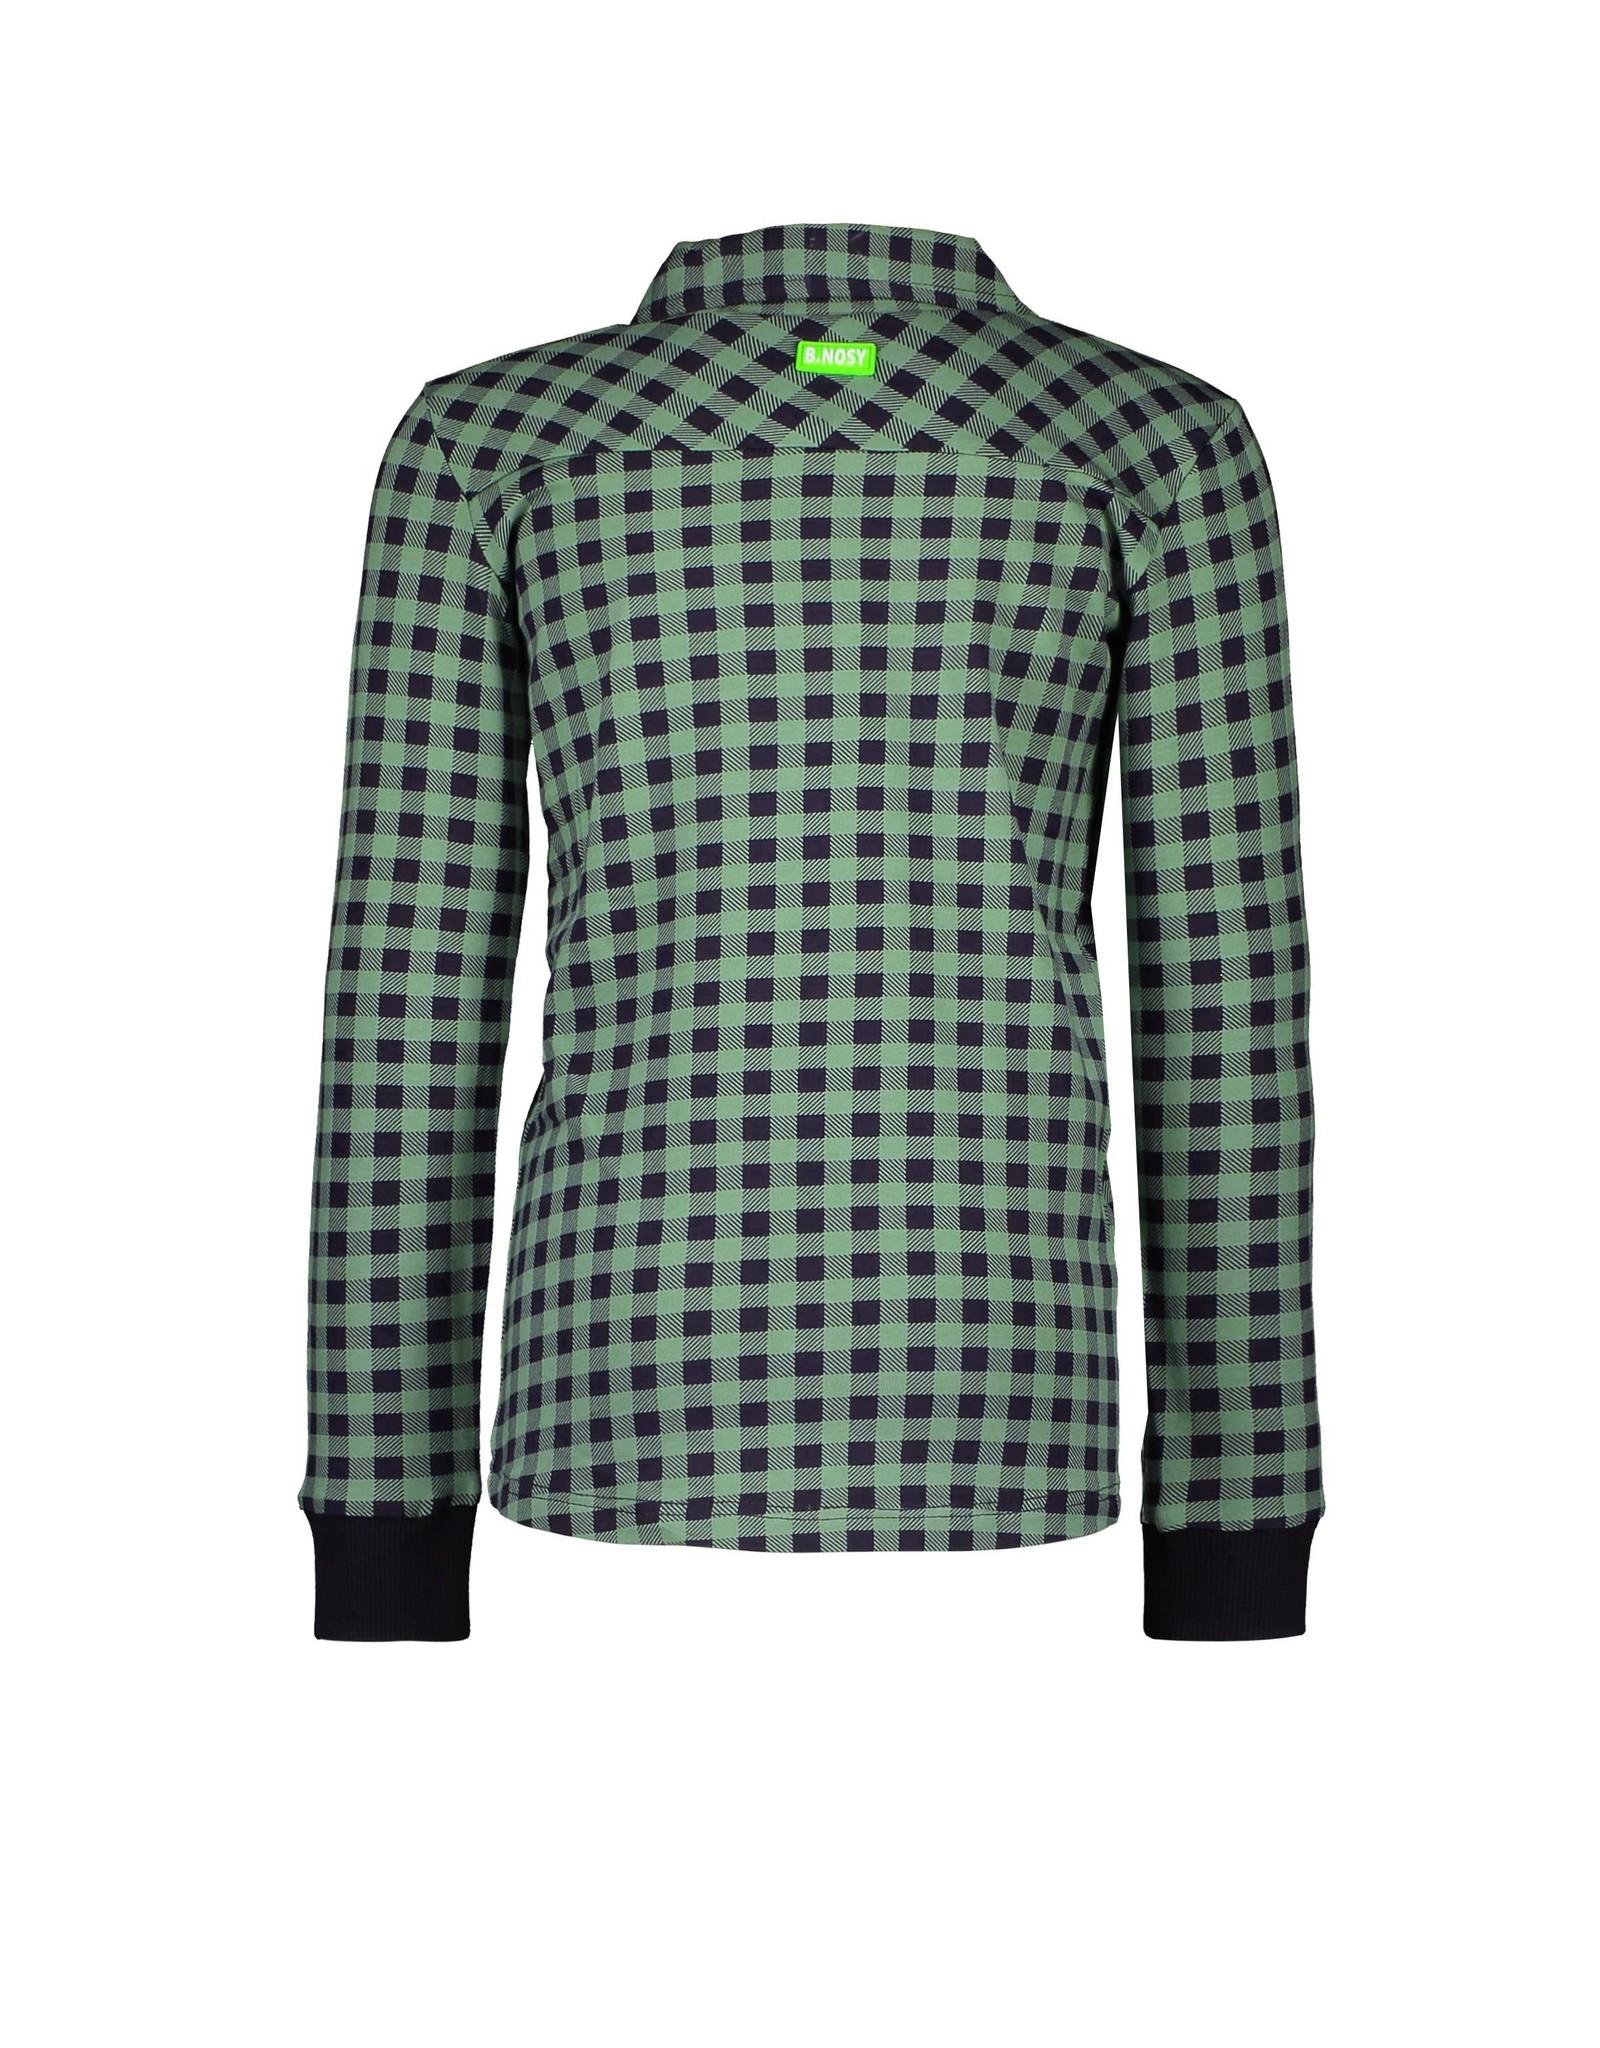 B-Nosy Boys jersey blouse with zipper, rib at cuffs, Hunter check